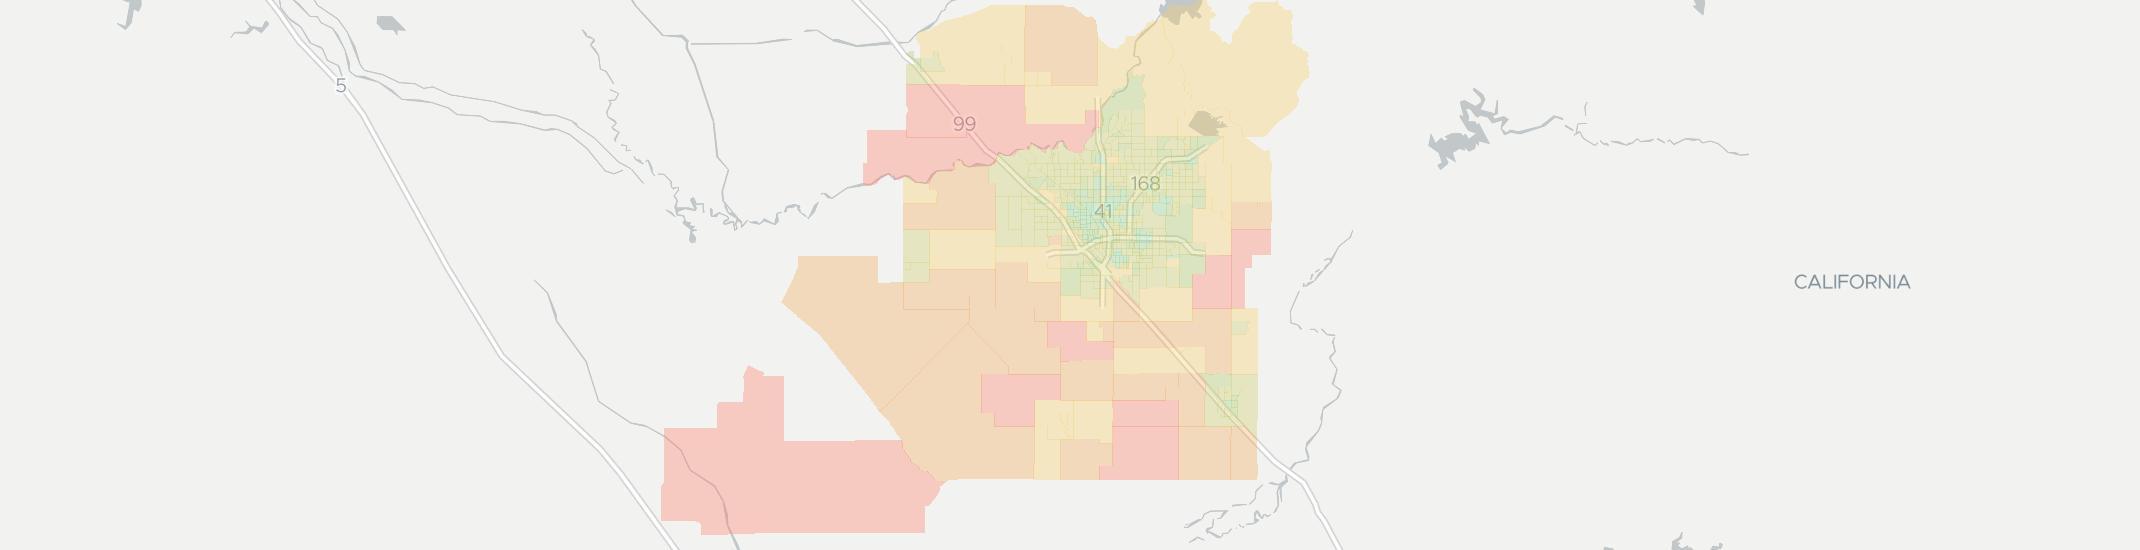 Comcast Coverage Map California